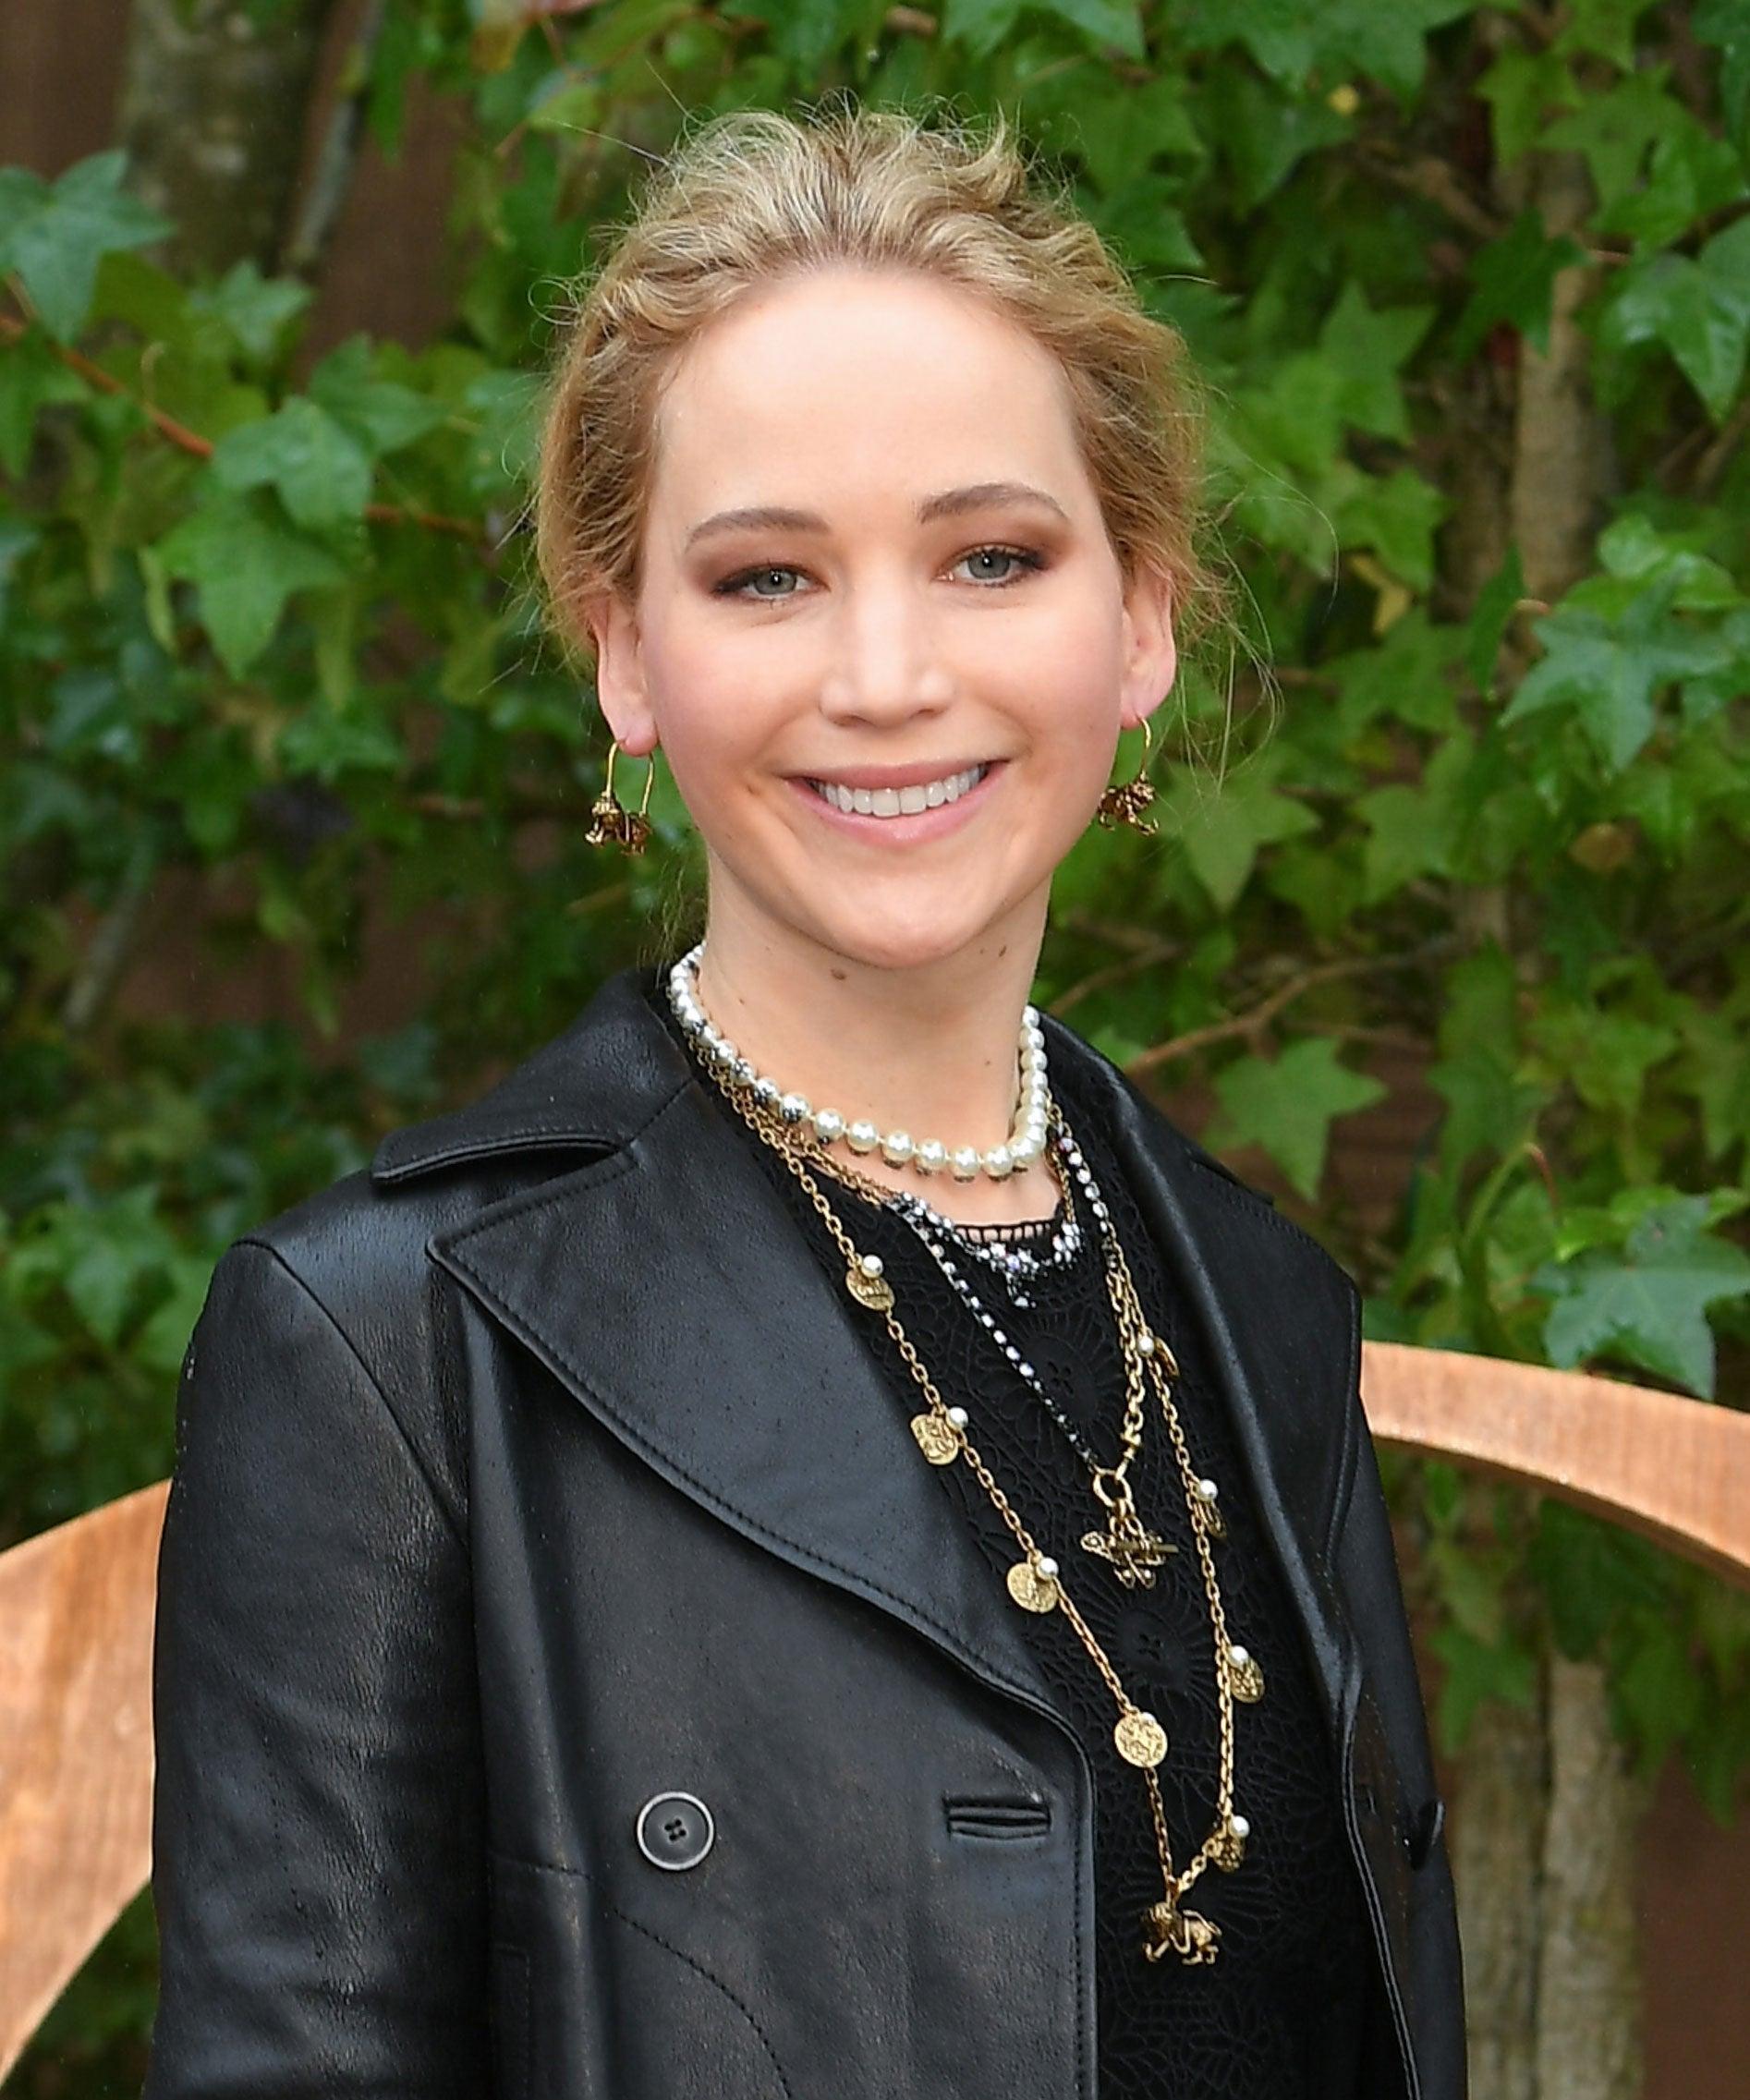 Jennifer Lawrence Cate Blanchett To Star In New Film